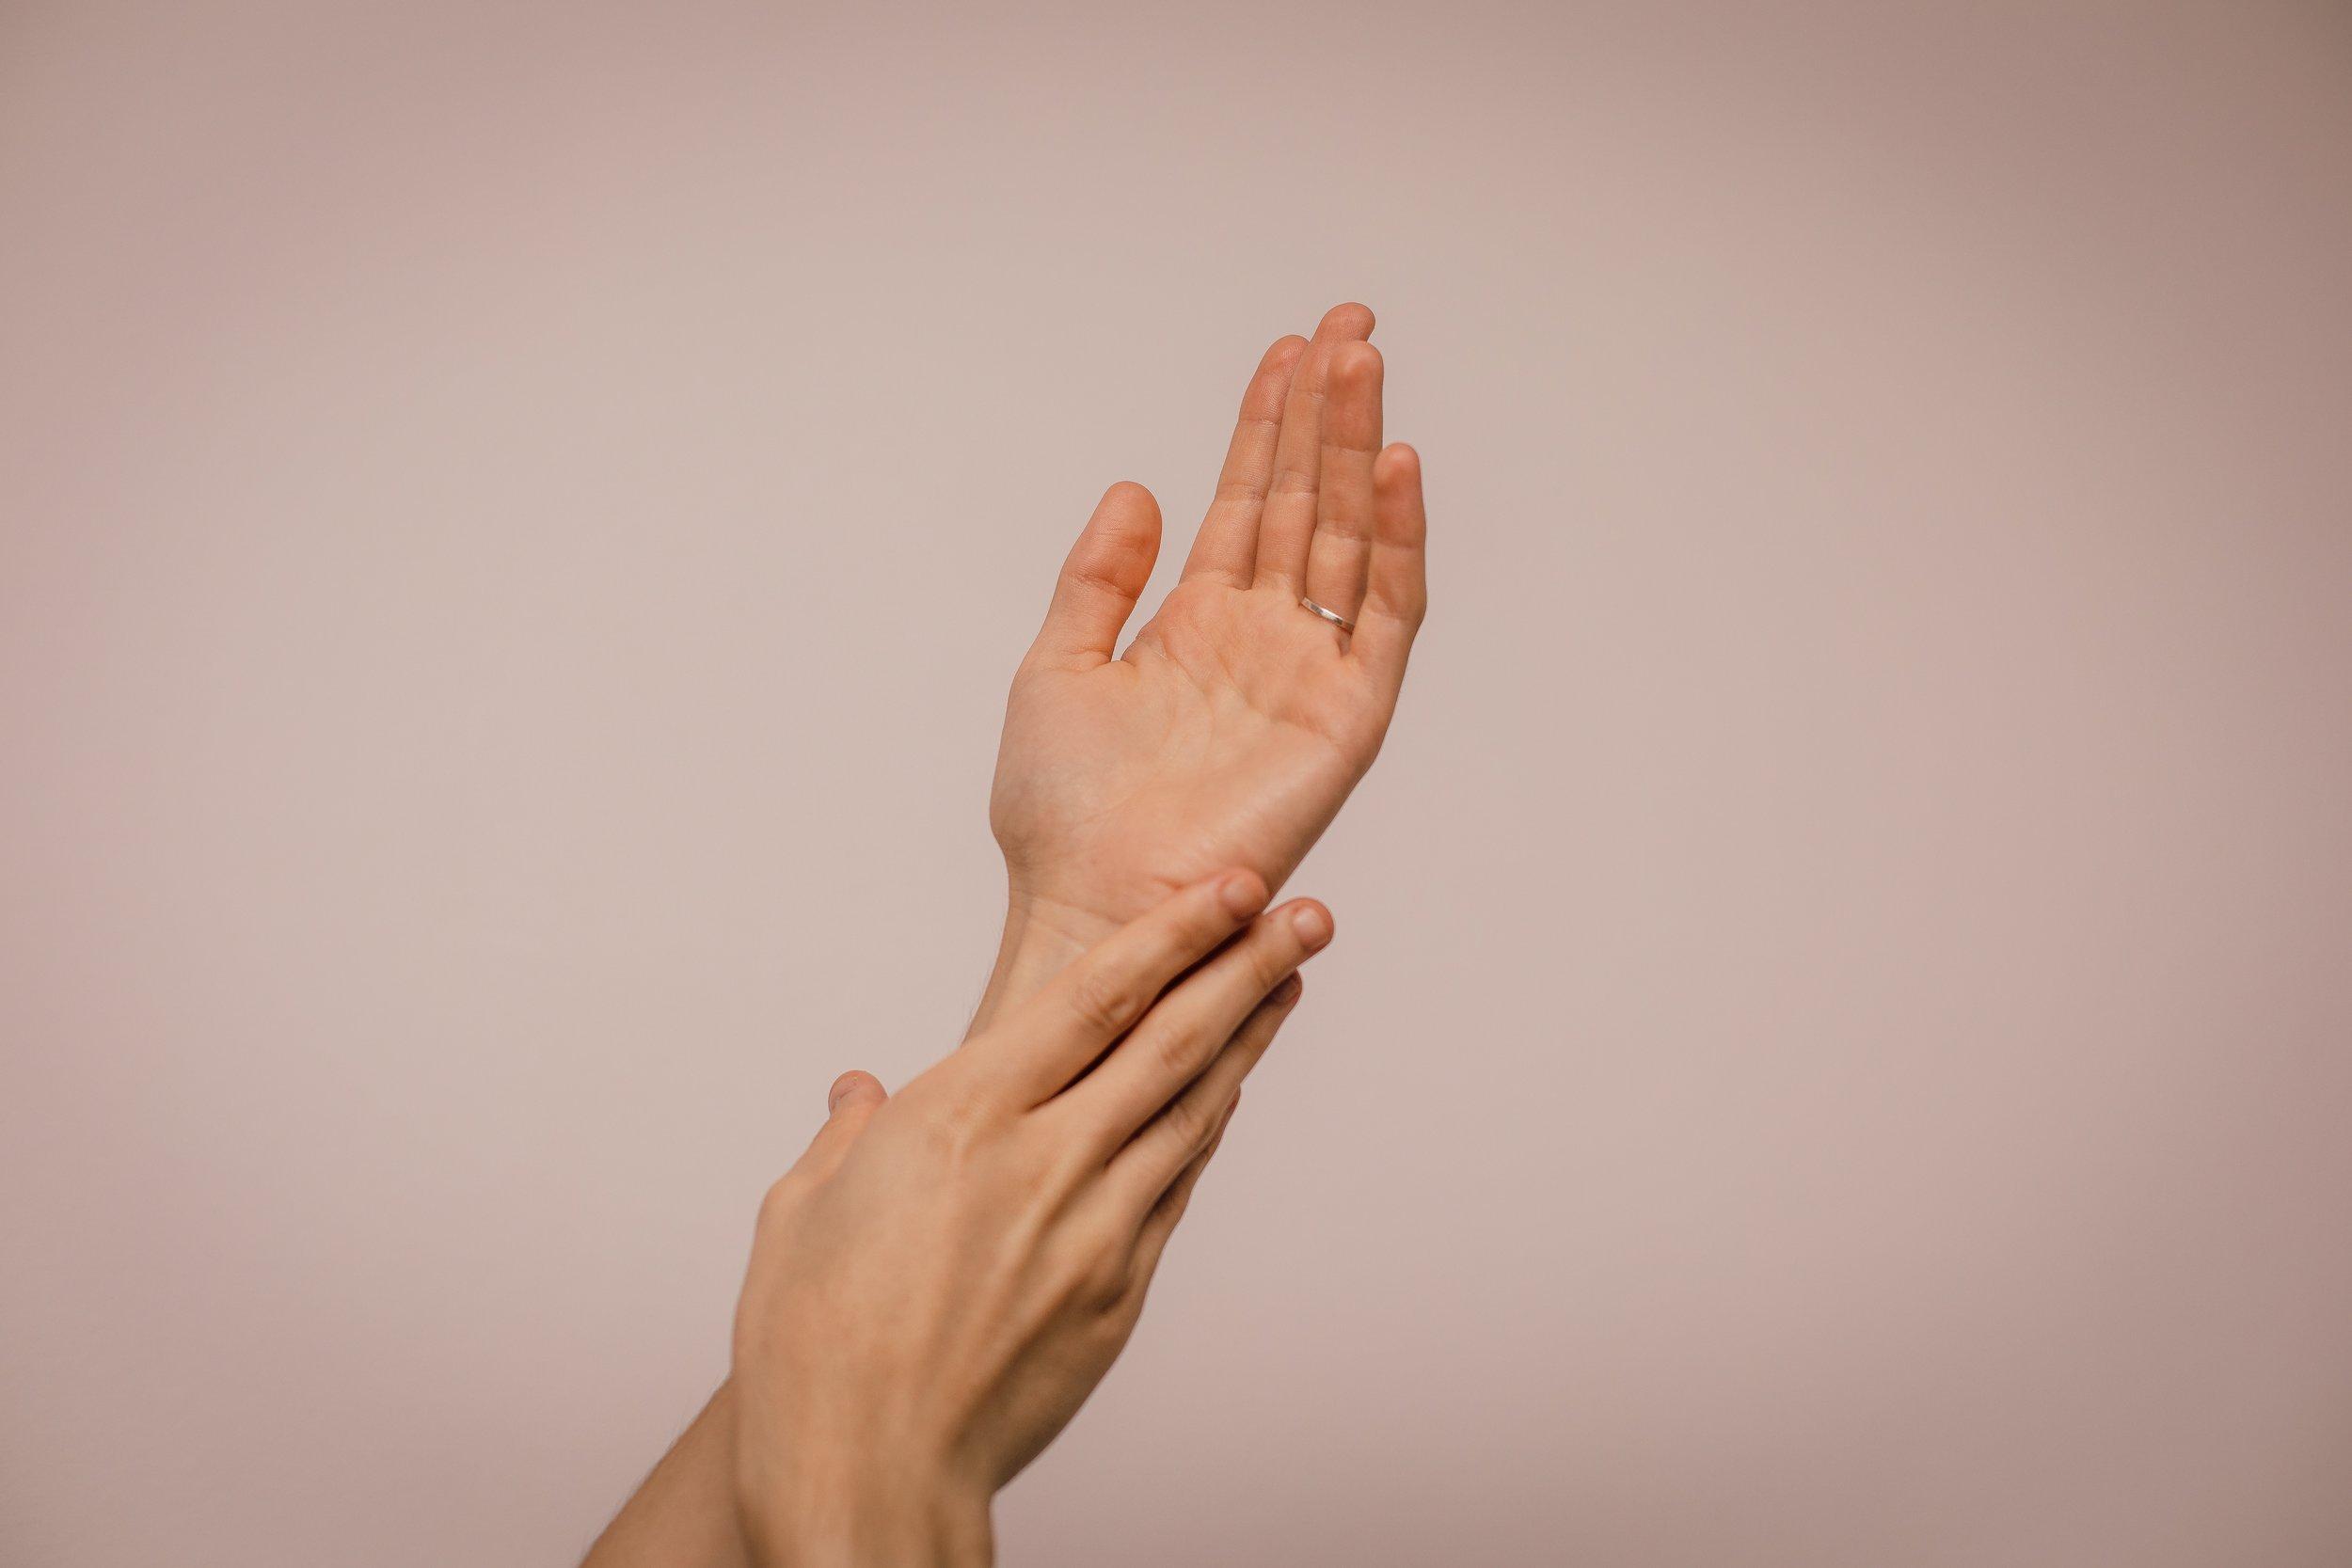 skin, skin facts, facts about skin, weird skin facts, dermatology, tampa dermatology, tampa dermatologist, dermatologist in tampa, academic alliance in dermatology, skincare blog